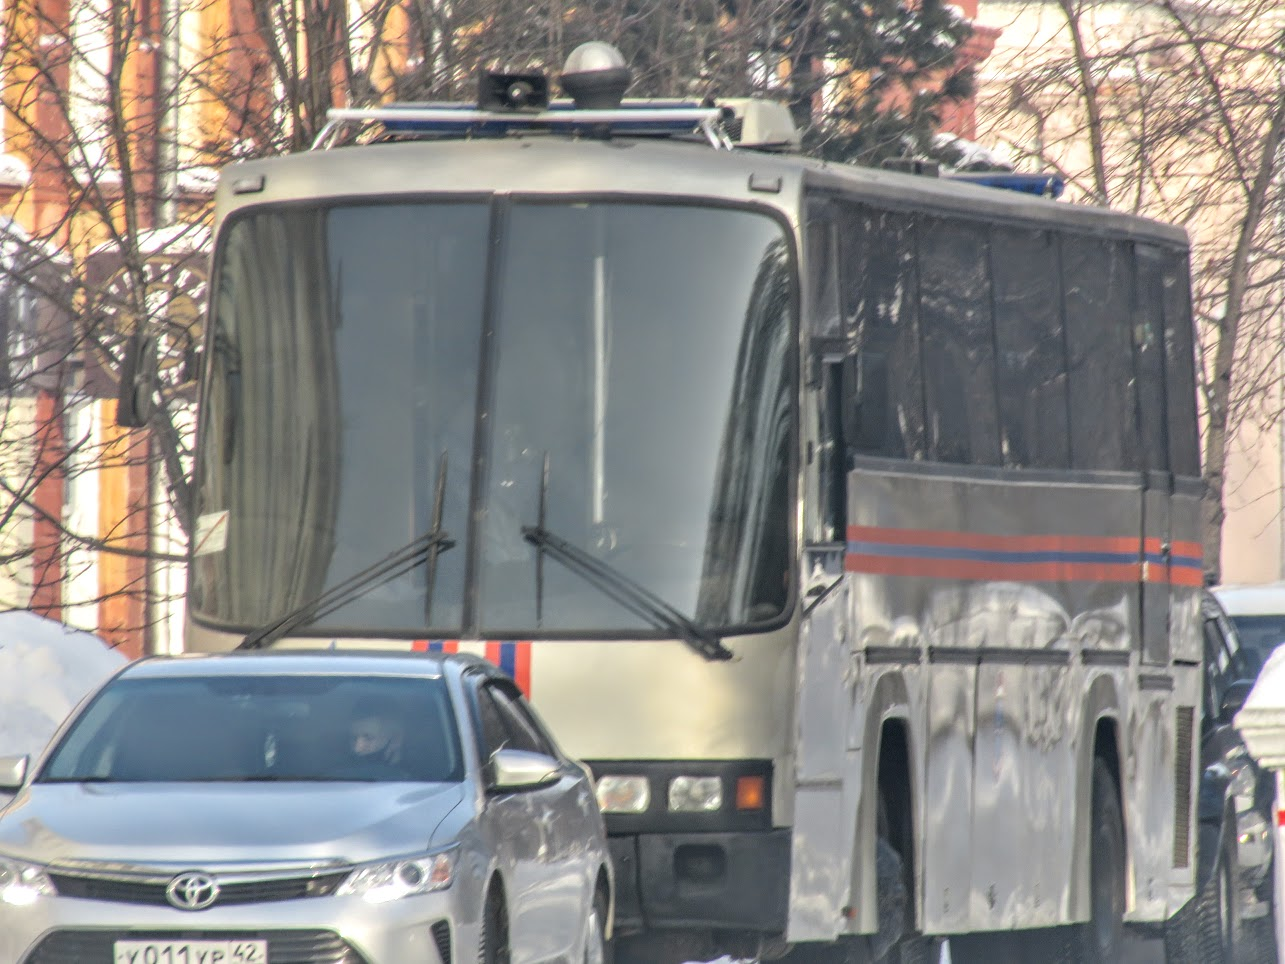 Транспорт не ходит - трамваи, троллейбусы. Полиция, люди, автозаки по городу IMG 1793